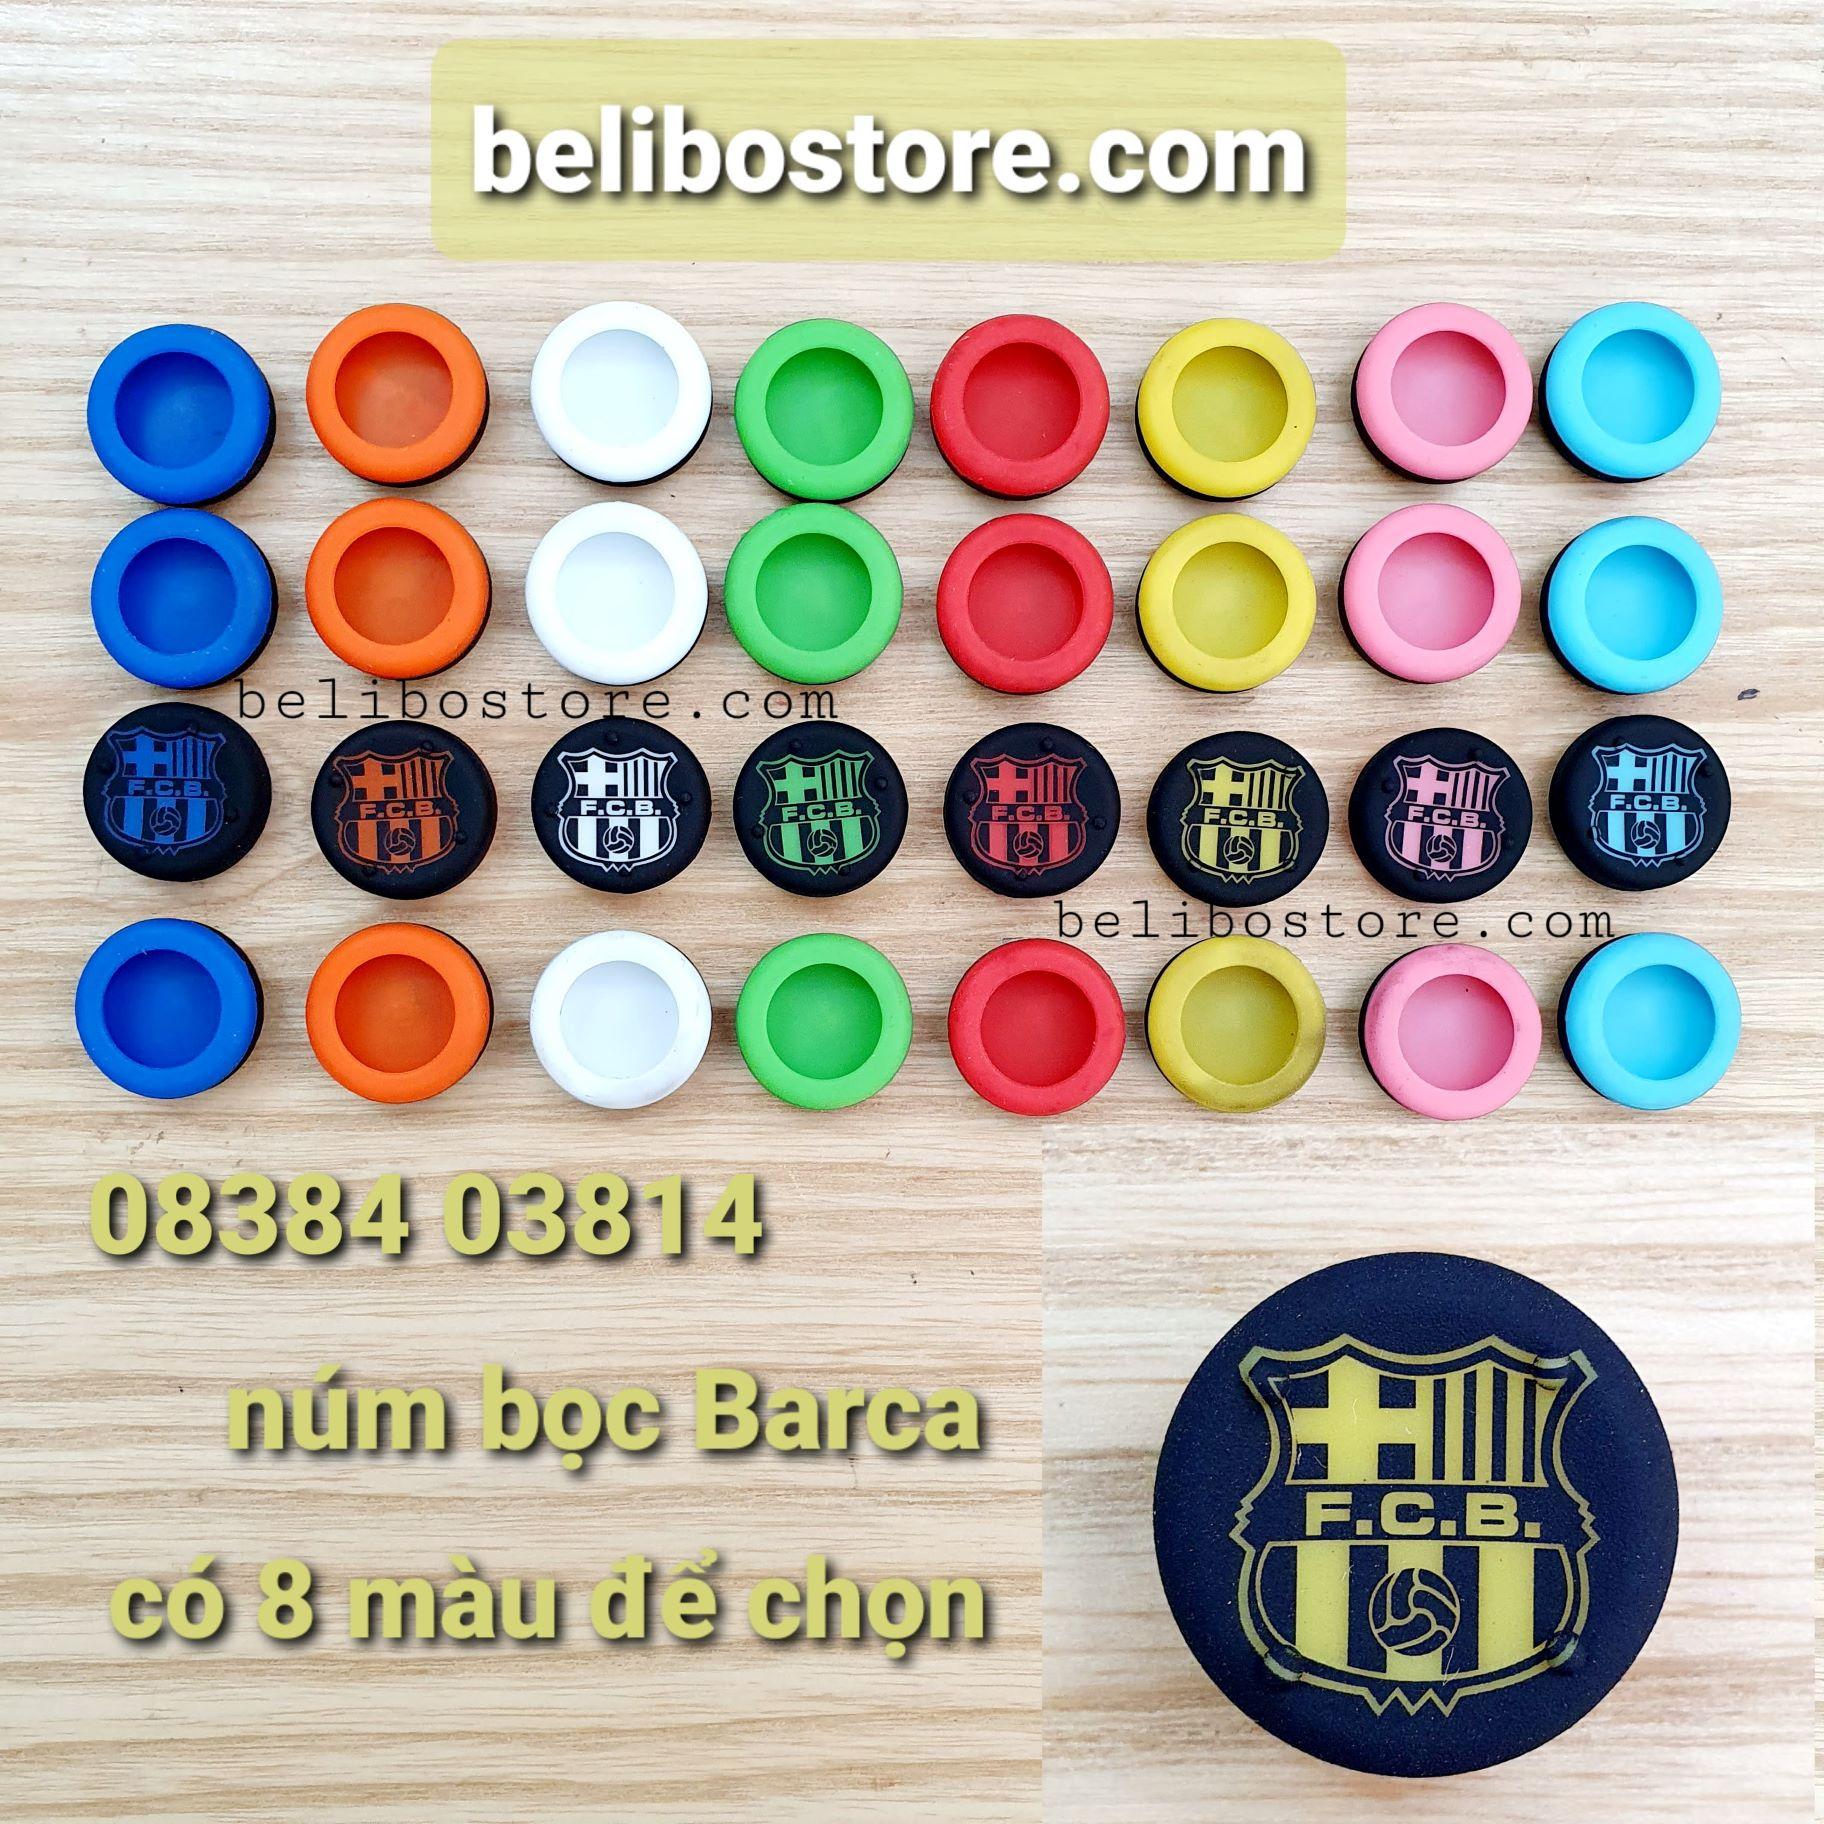 barcelona-combo-2-nu-m-cao-su-bo-c-ca-n-analog-cho-tay-ca-m-choi-game